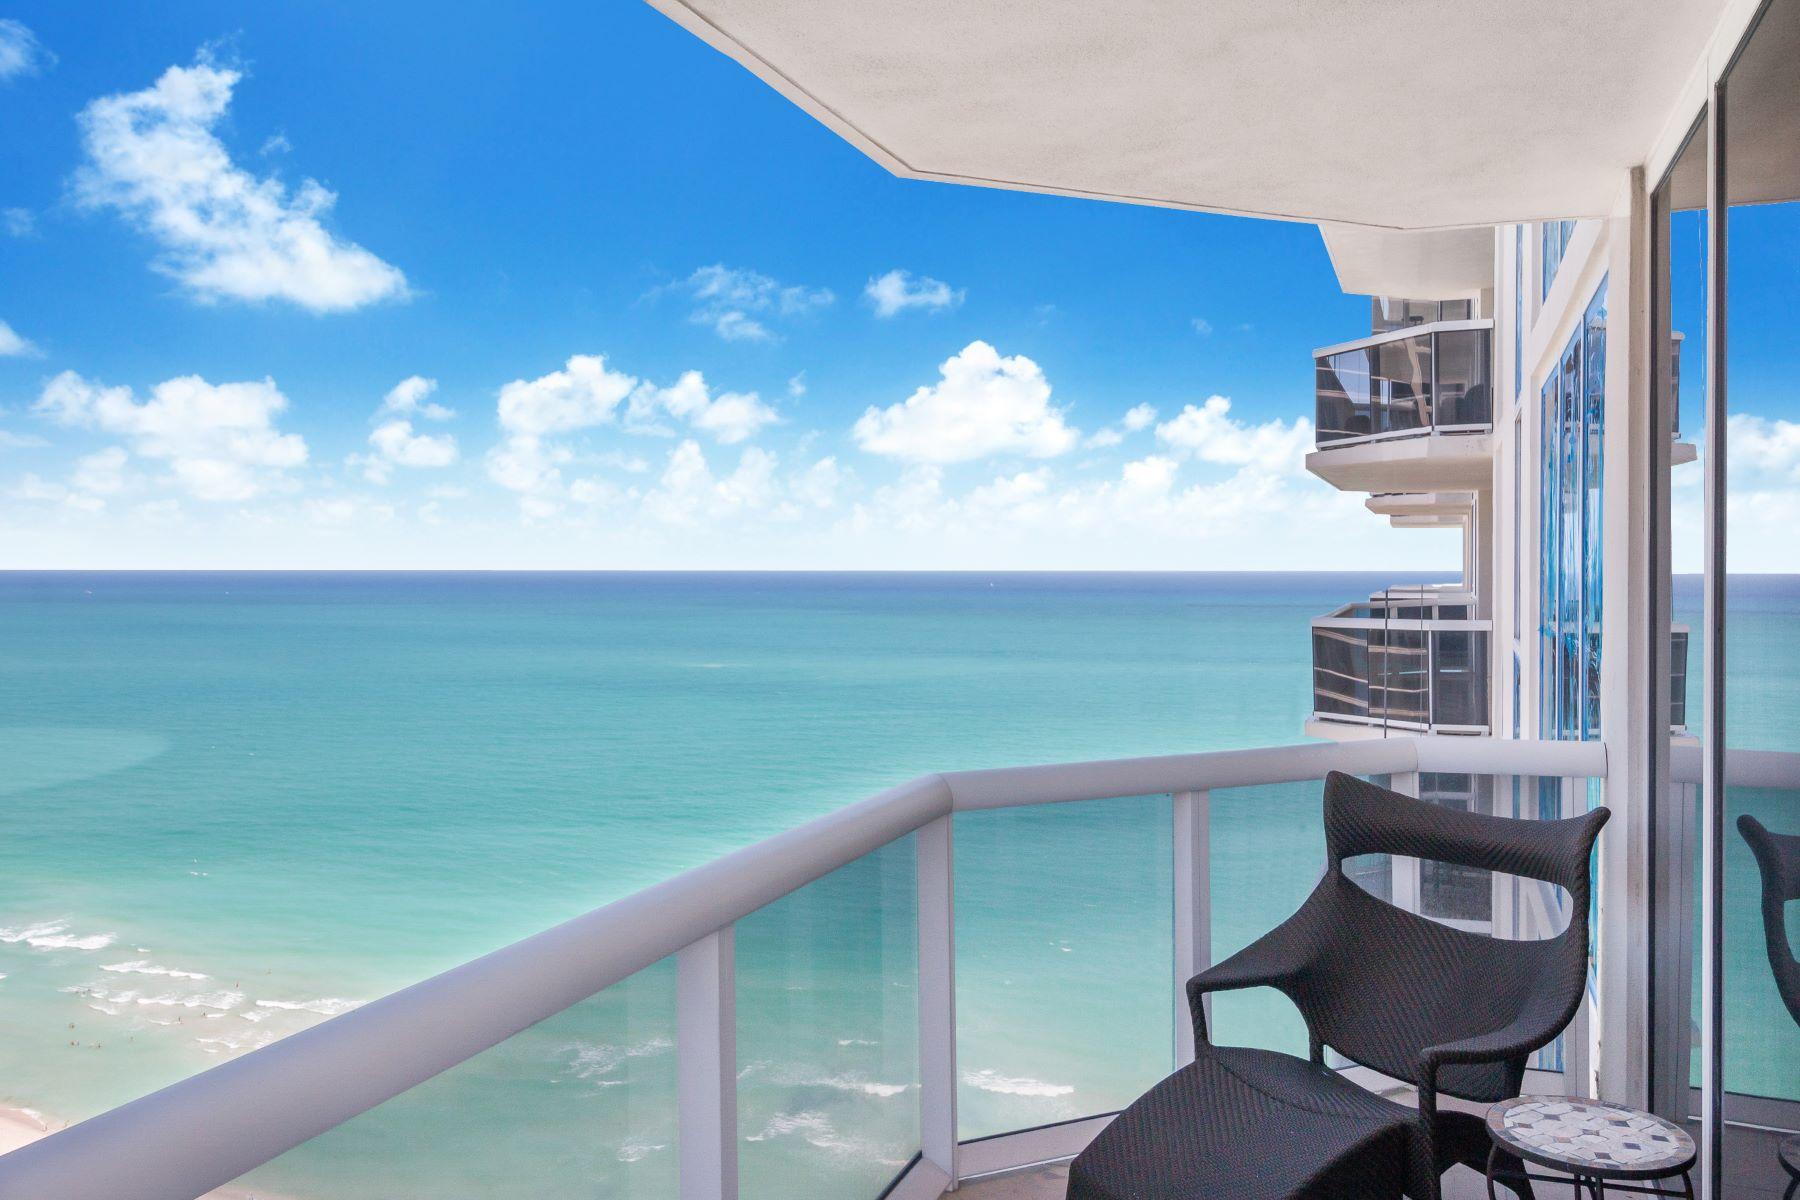 Condominium for Sale at 4775 Collins Ave 4775 Collins Ave 3307, Miami Beach, Florida, 33140 United States